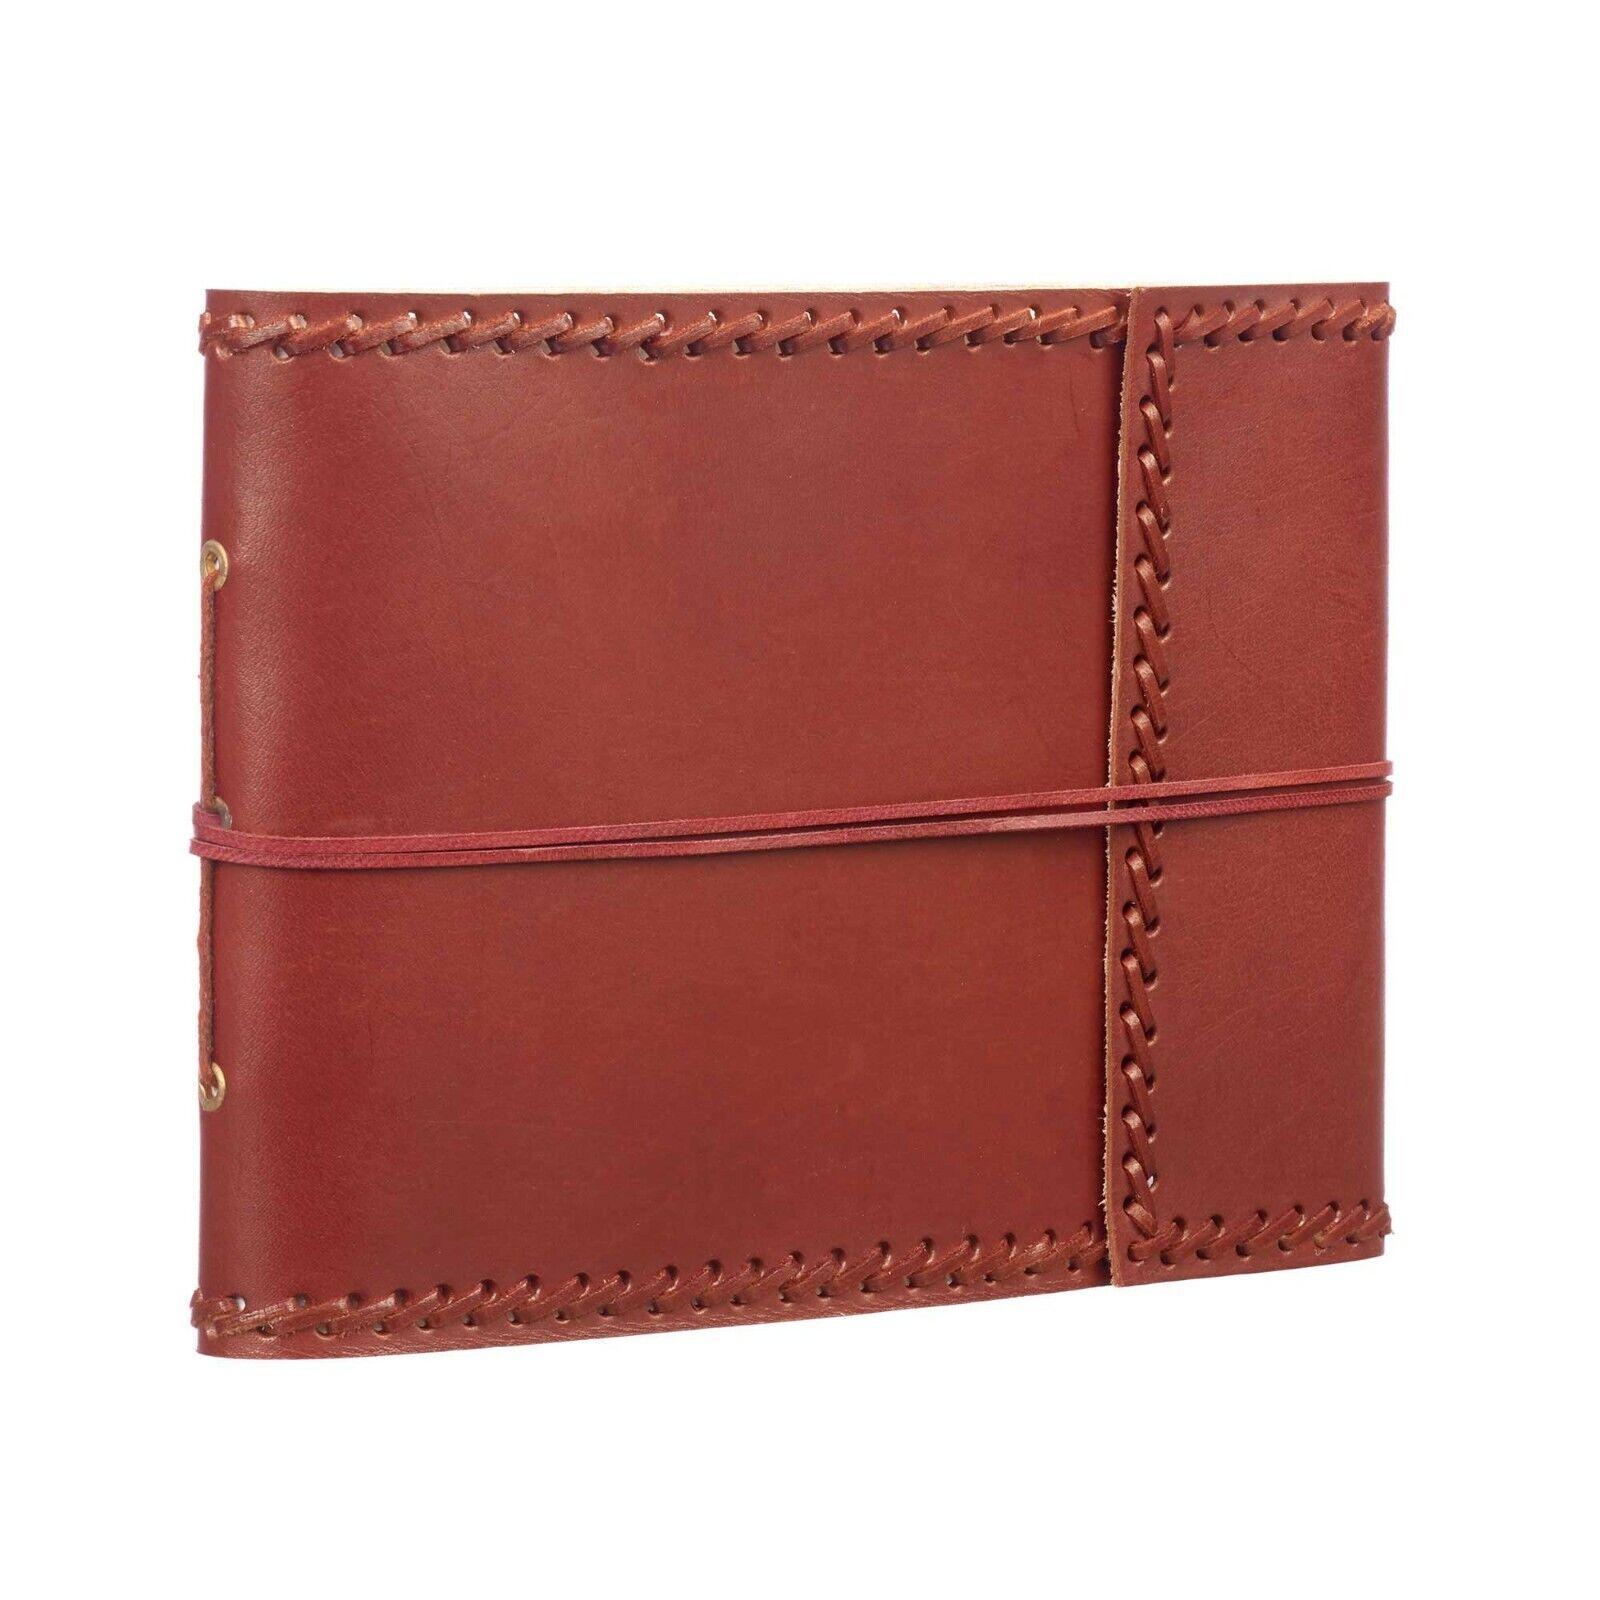 Medium Stitched Leather Album - Fair Trade Handmade Scrapbook - 2nd Quality